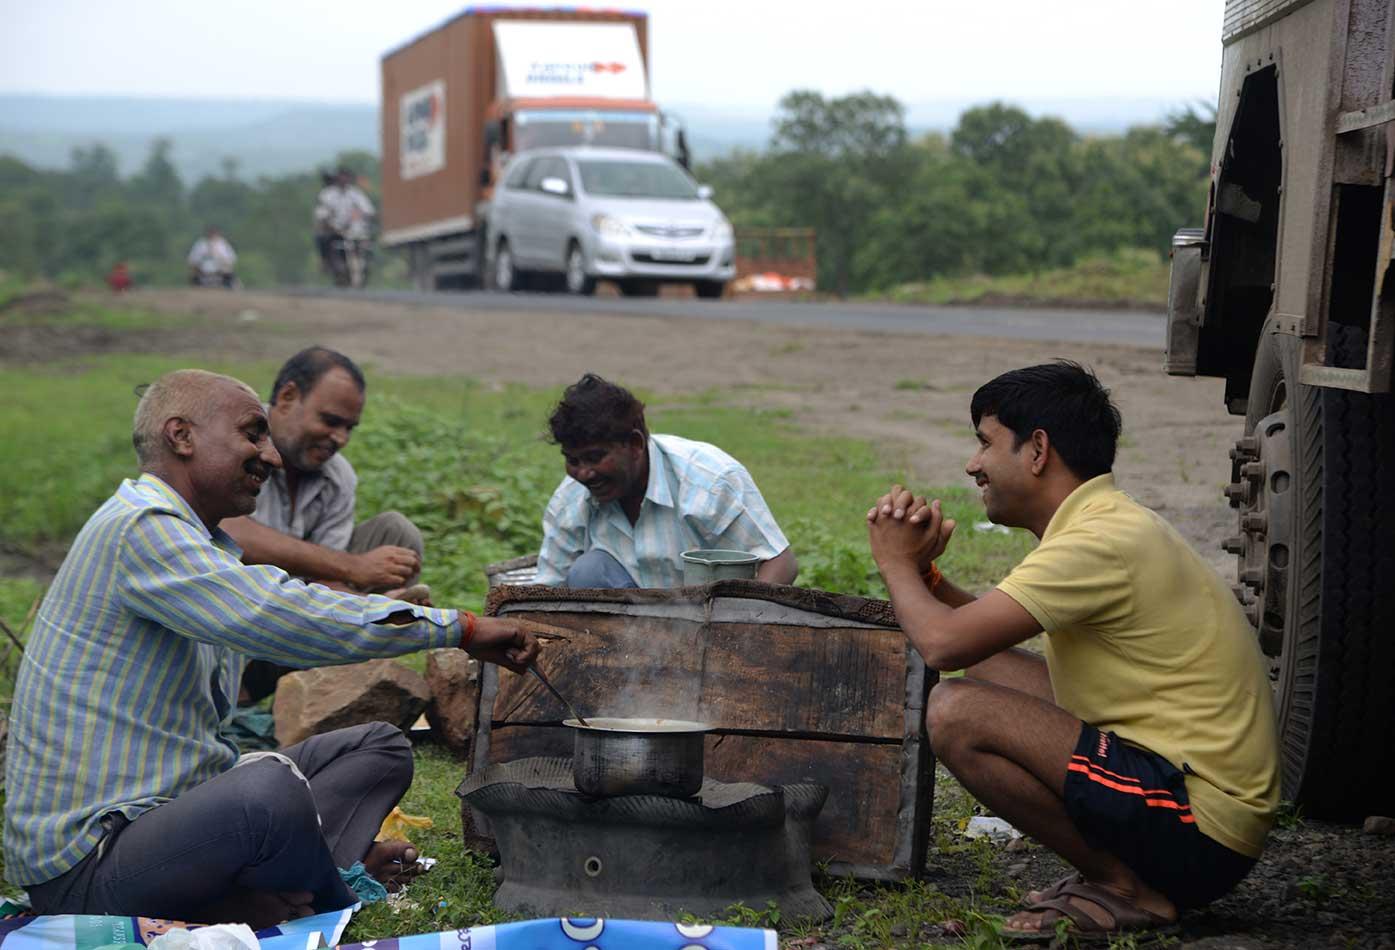 मुक्काम  : नरसिंहपूर, मध्य प्रदेश